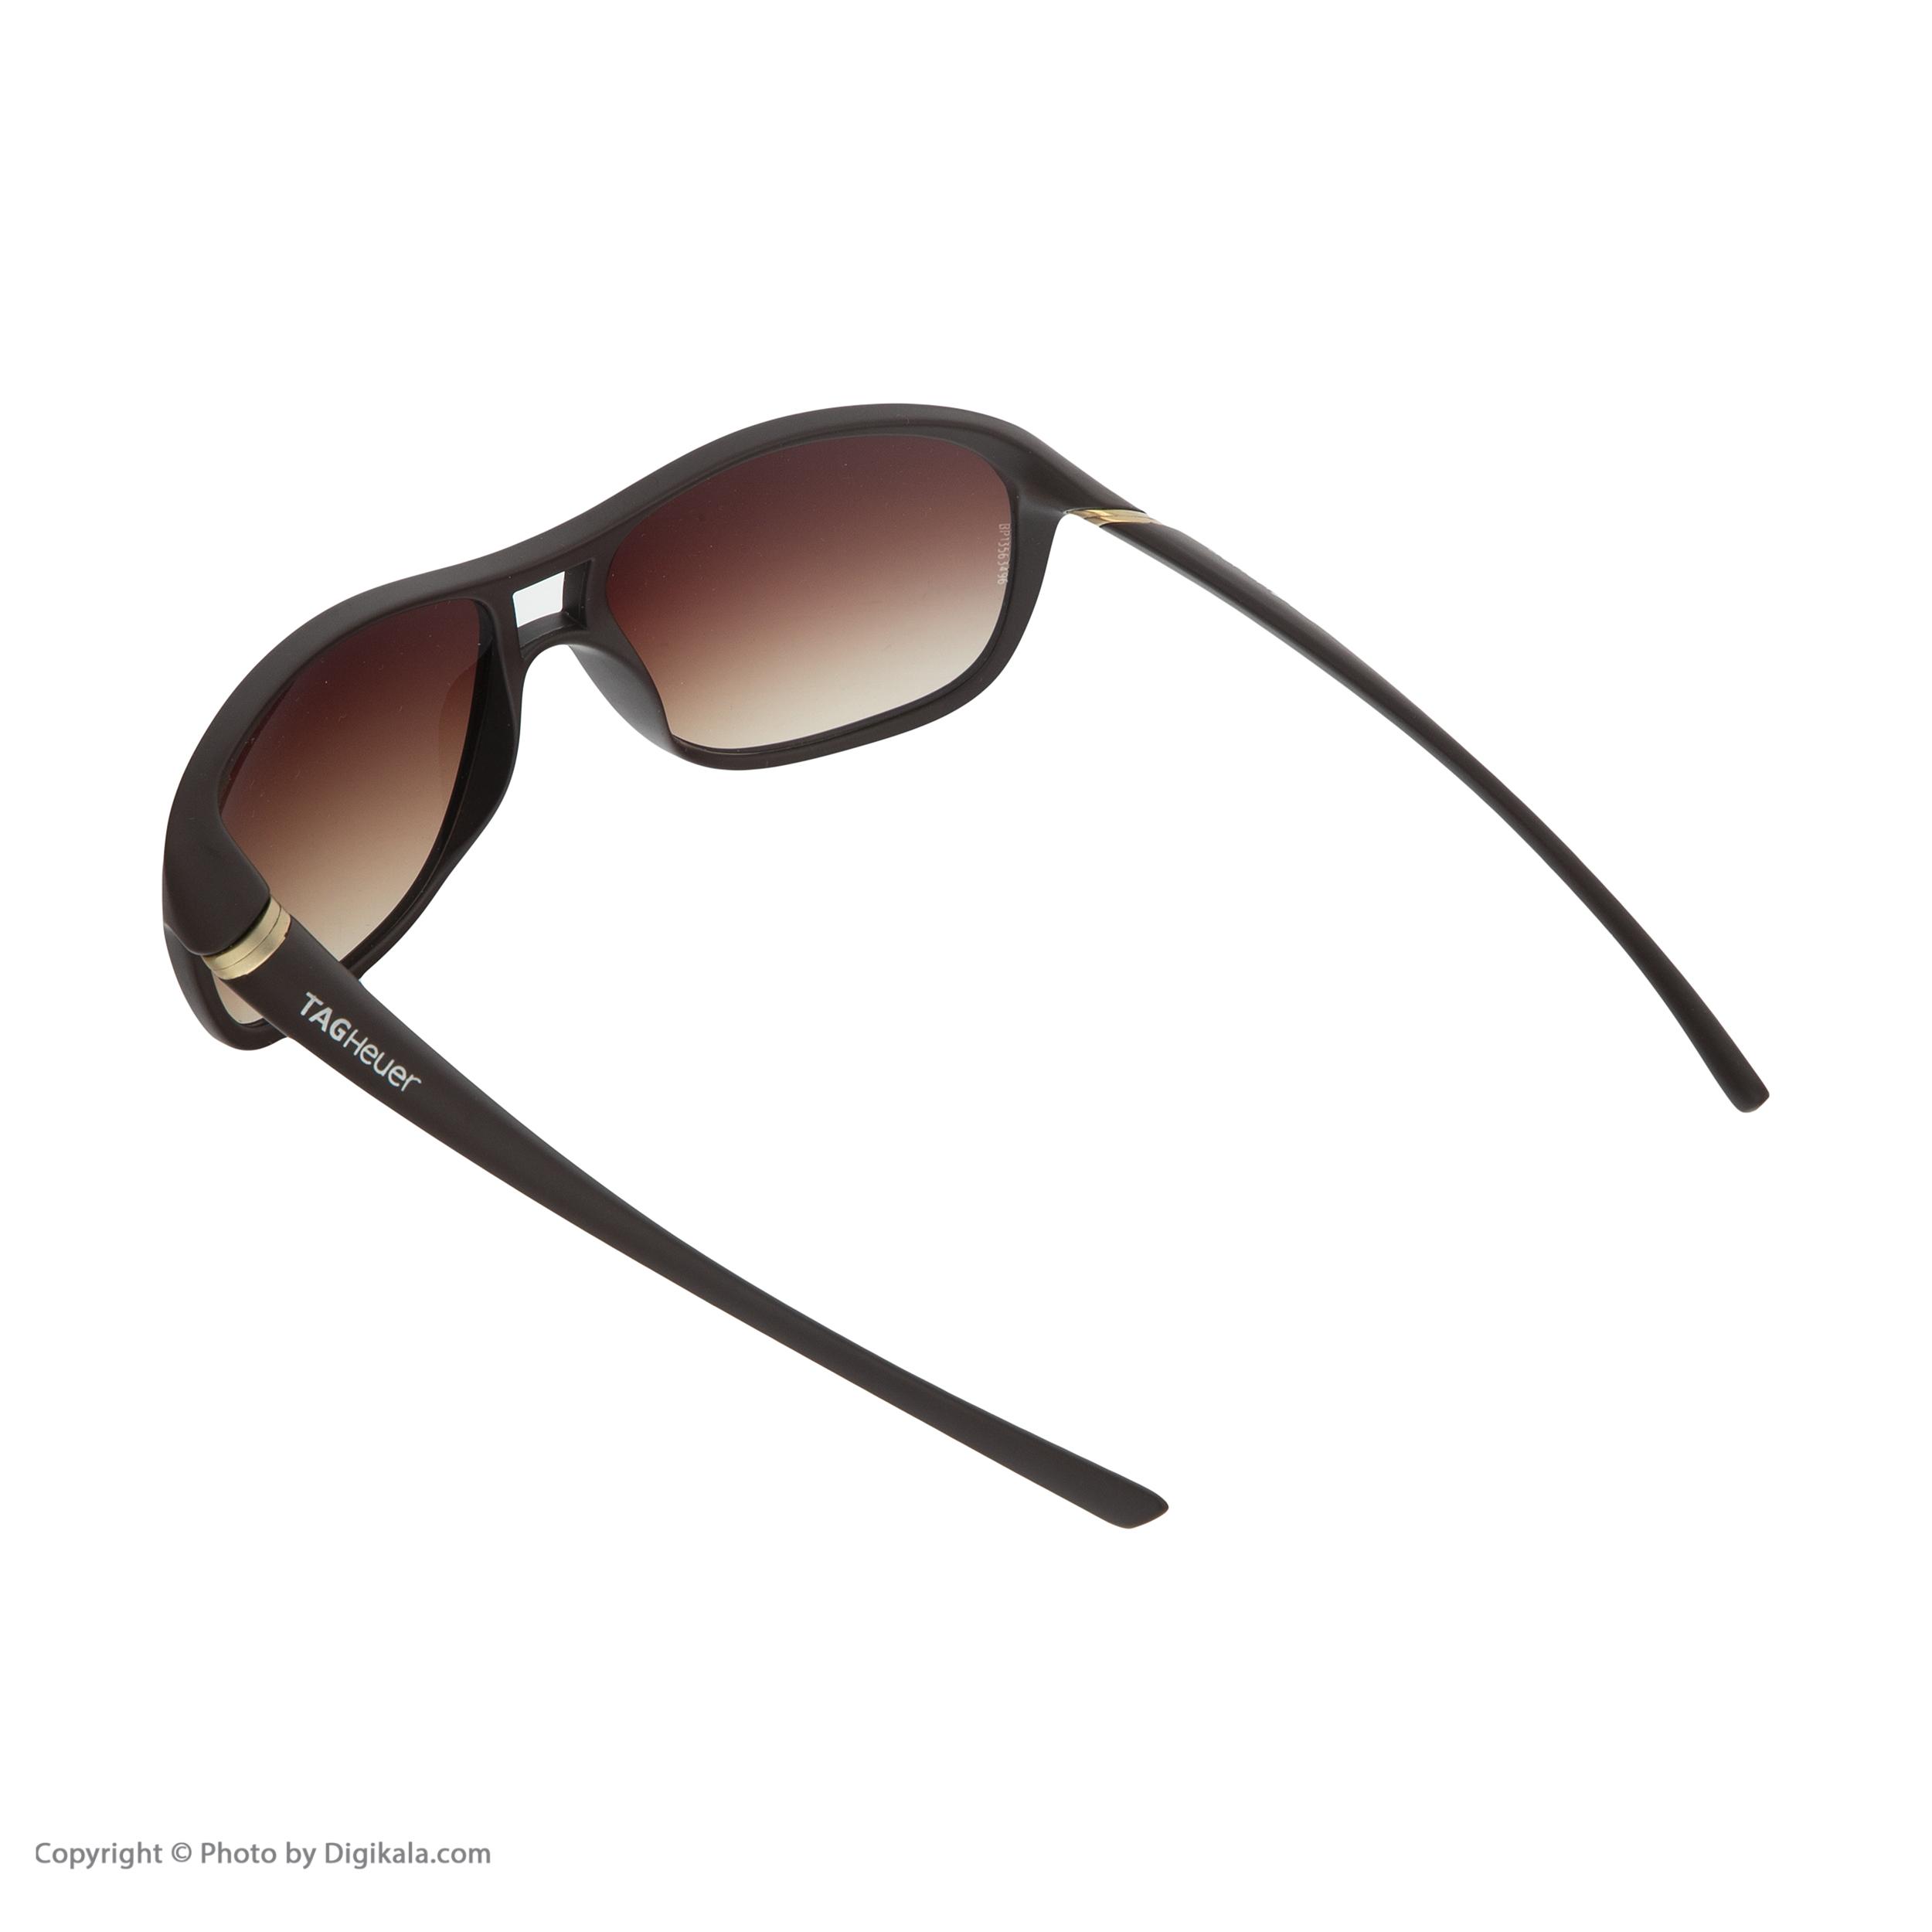 عینک آفتابی تگ هویر مدل 6043 -  - 3